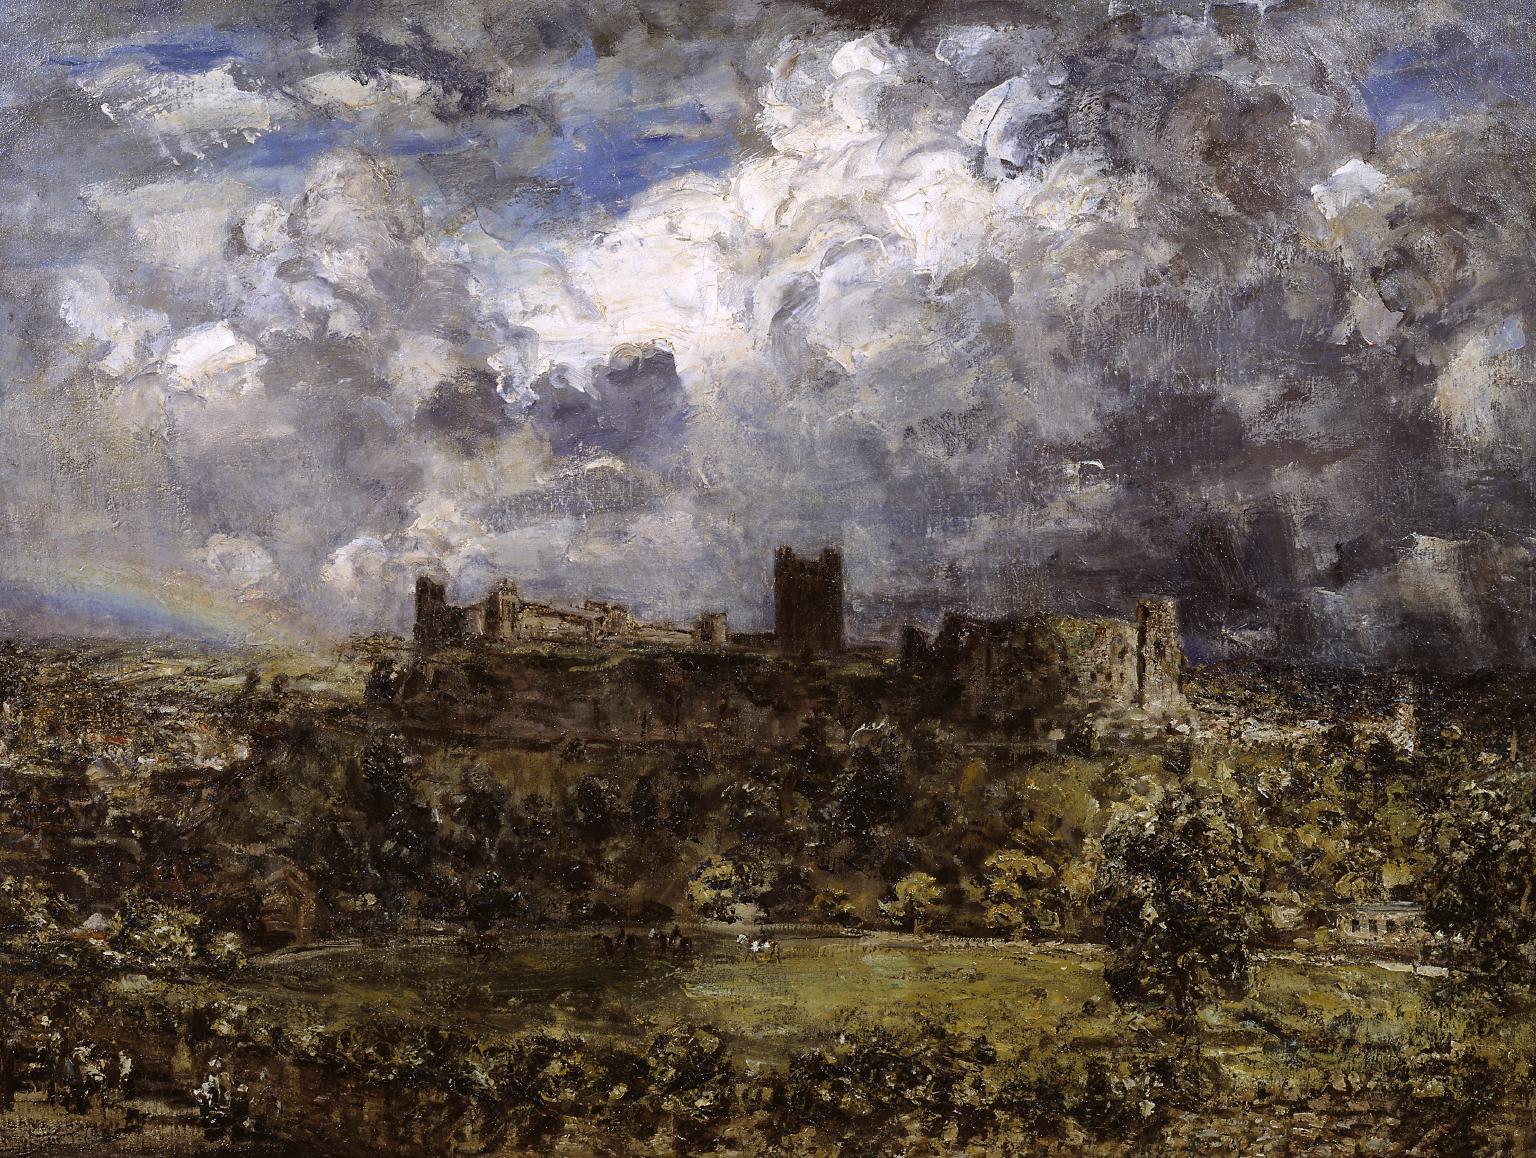 Philip Wilson Steer, Richmond Castle, 1903, Oil on canvas, 76,8 x 102,2 cm, Tate Gallery, London